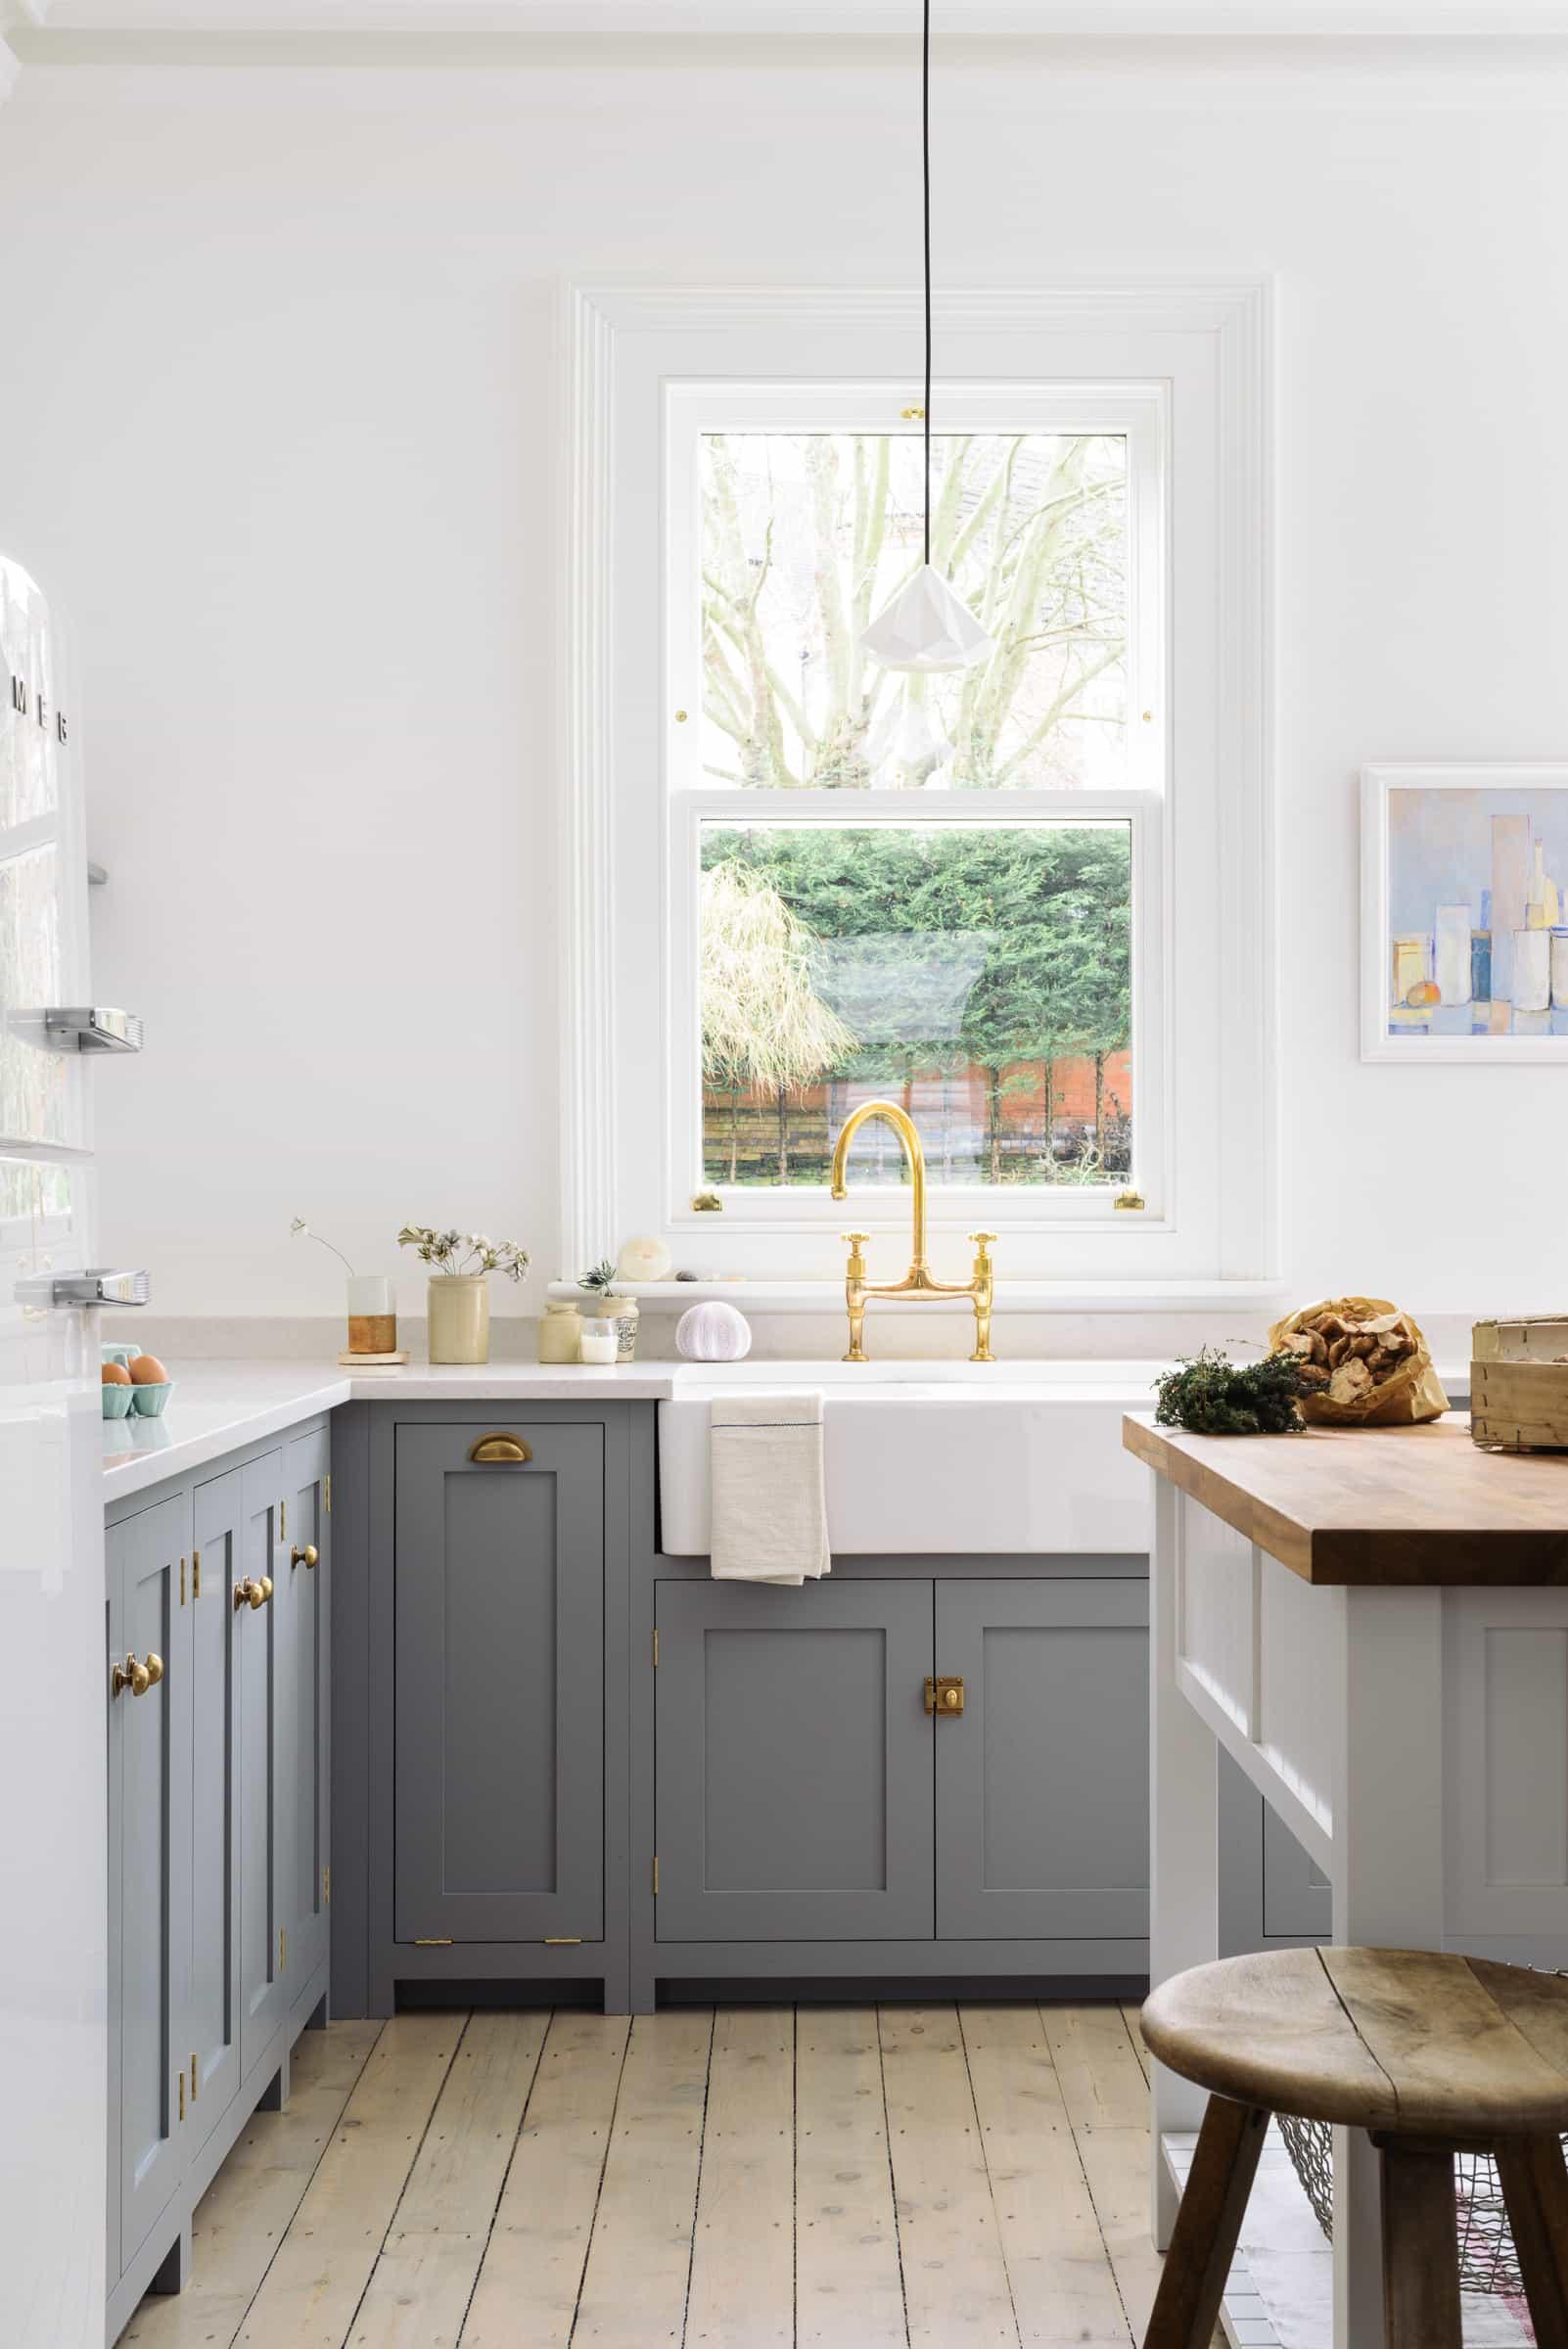 this is a deVOL farmhouse kitchen with a porcelain apron sink